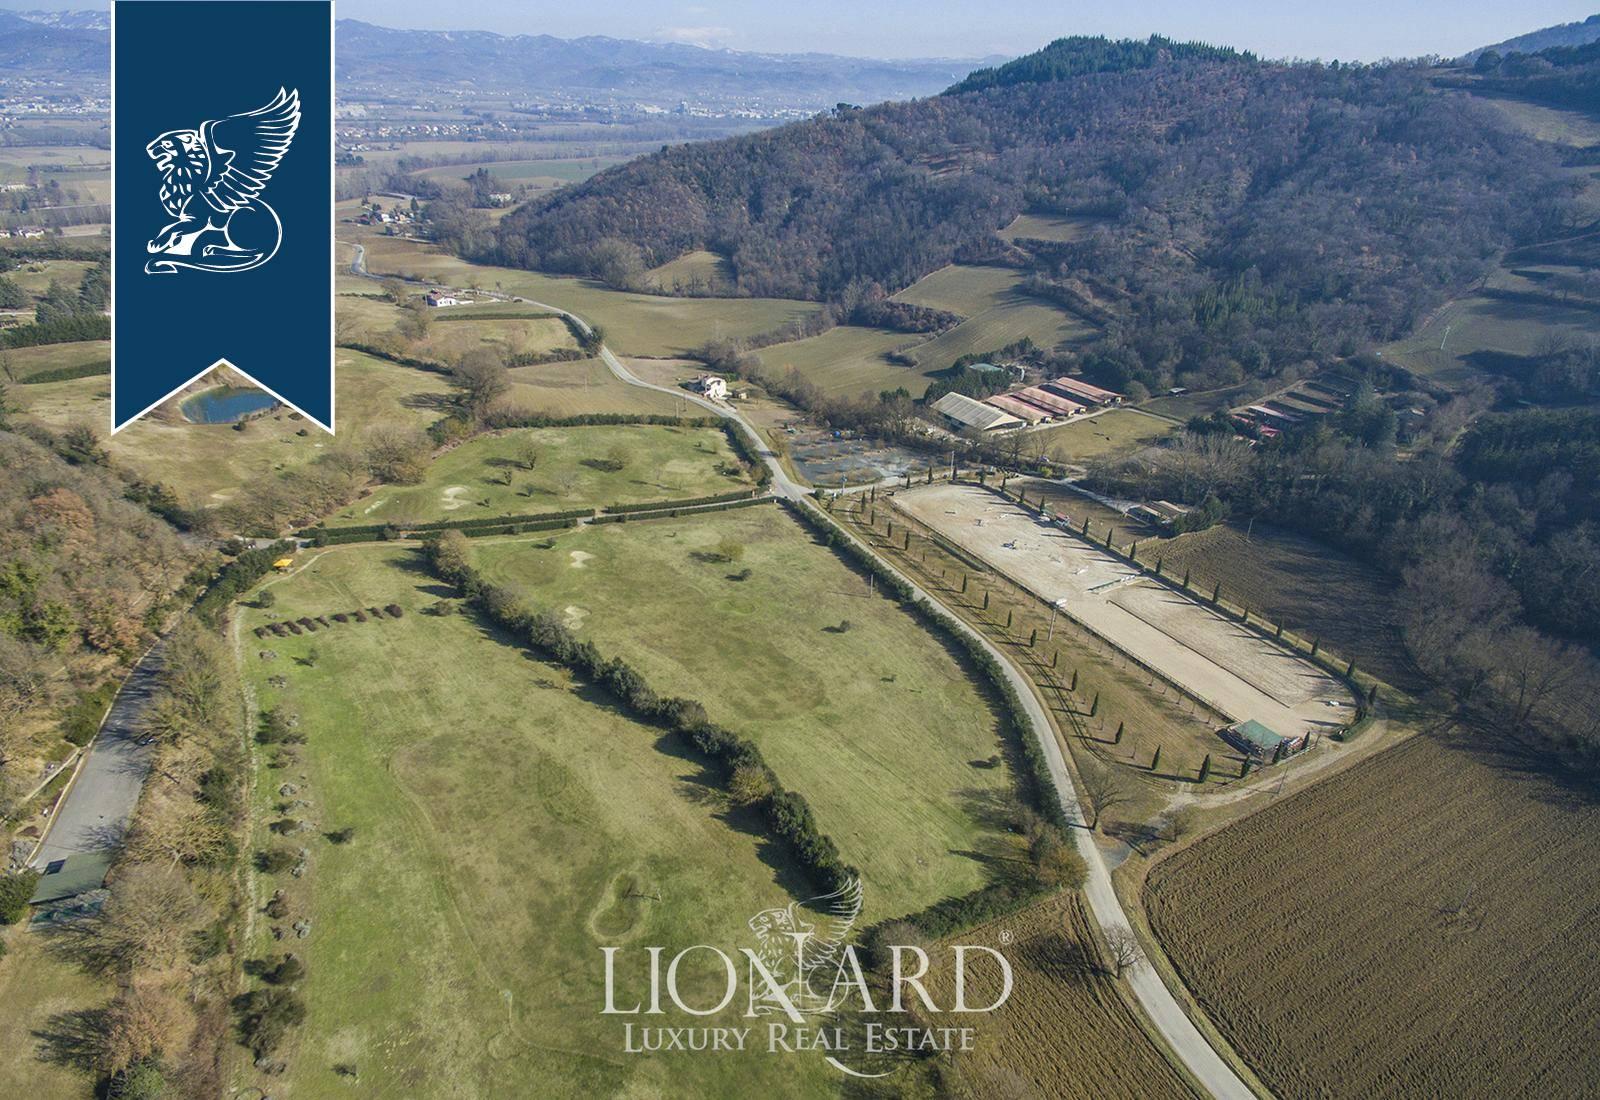 Agriturismo in Vendita a Citta' Di Castello: 0 locali, 1500 mq - Foto 6